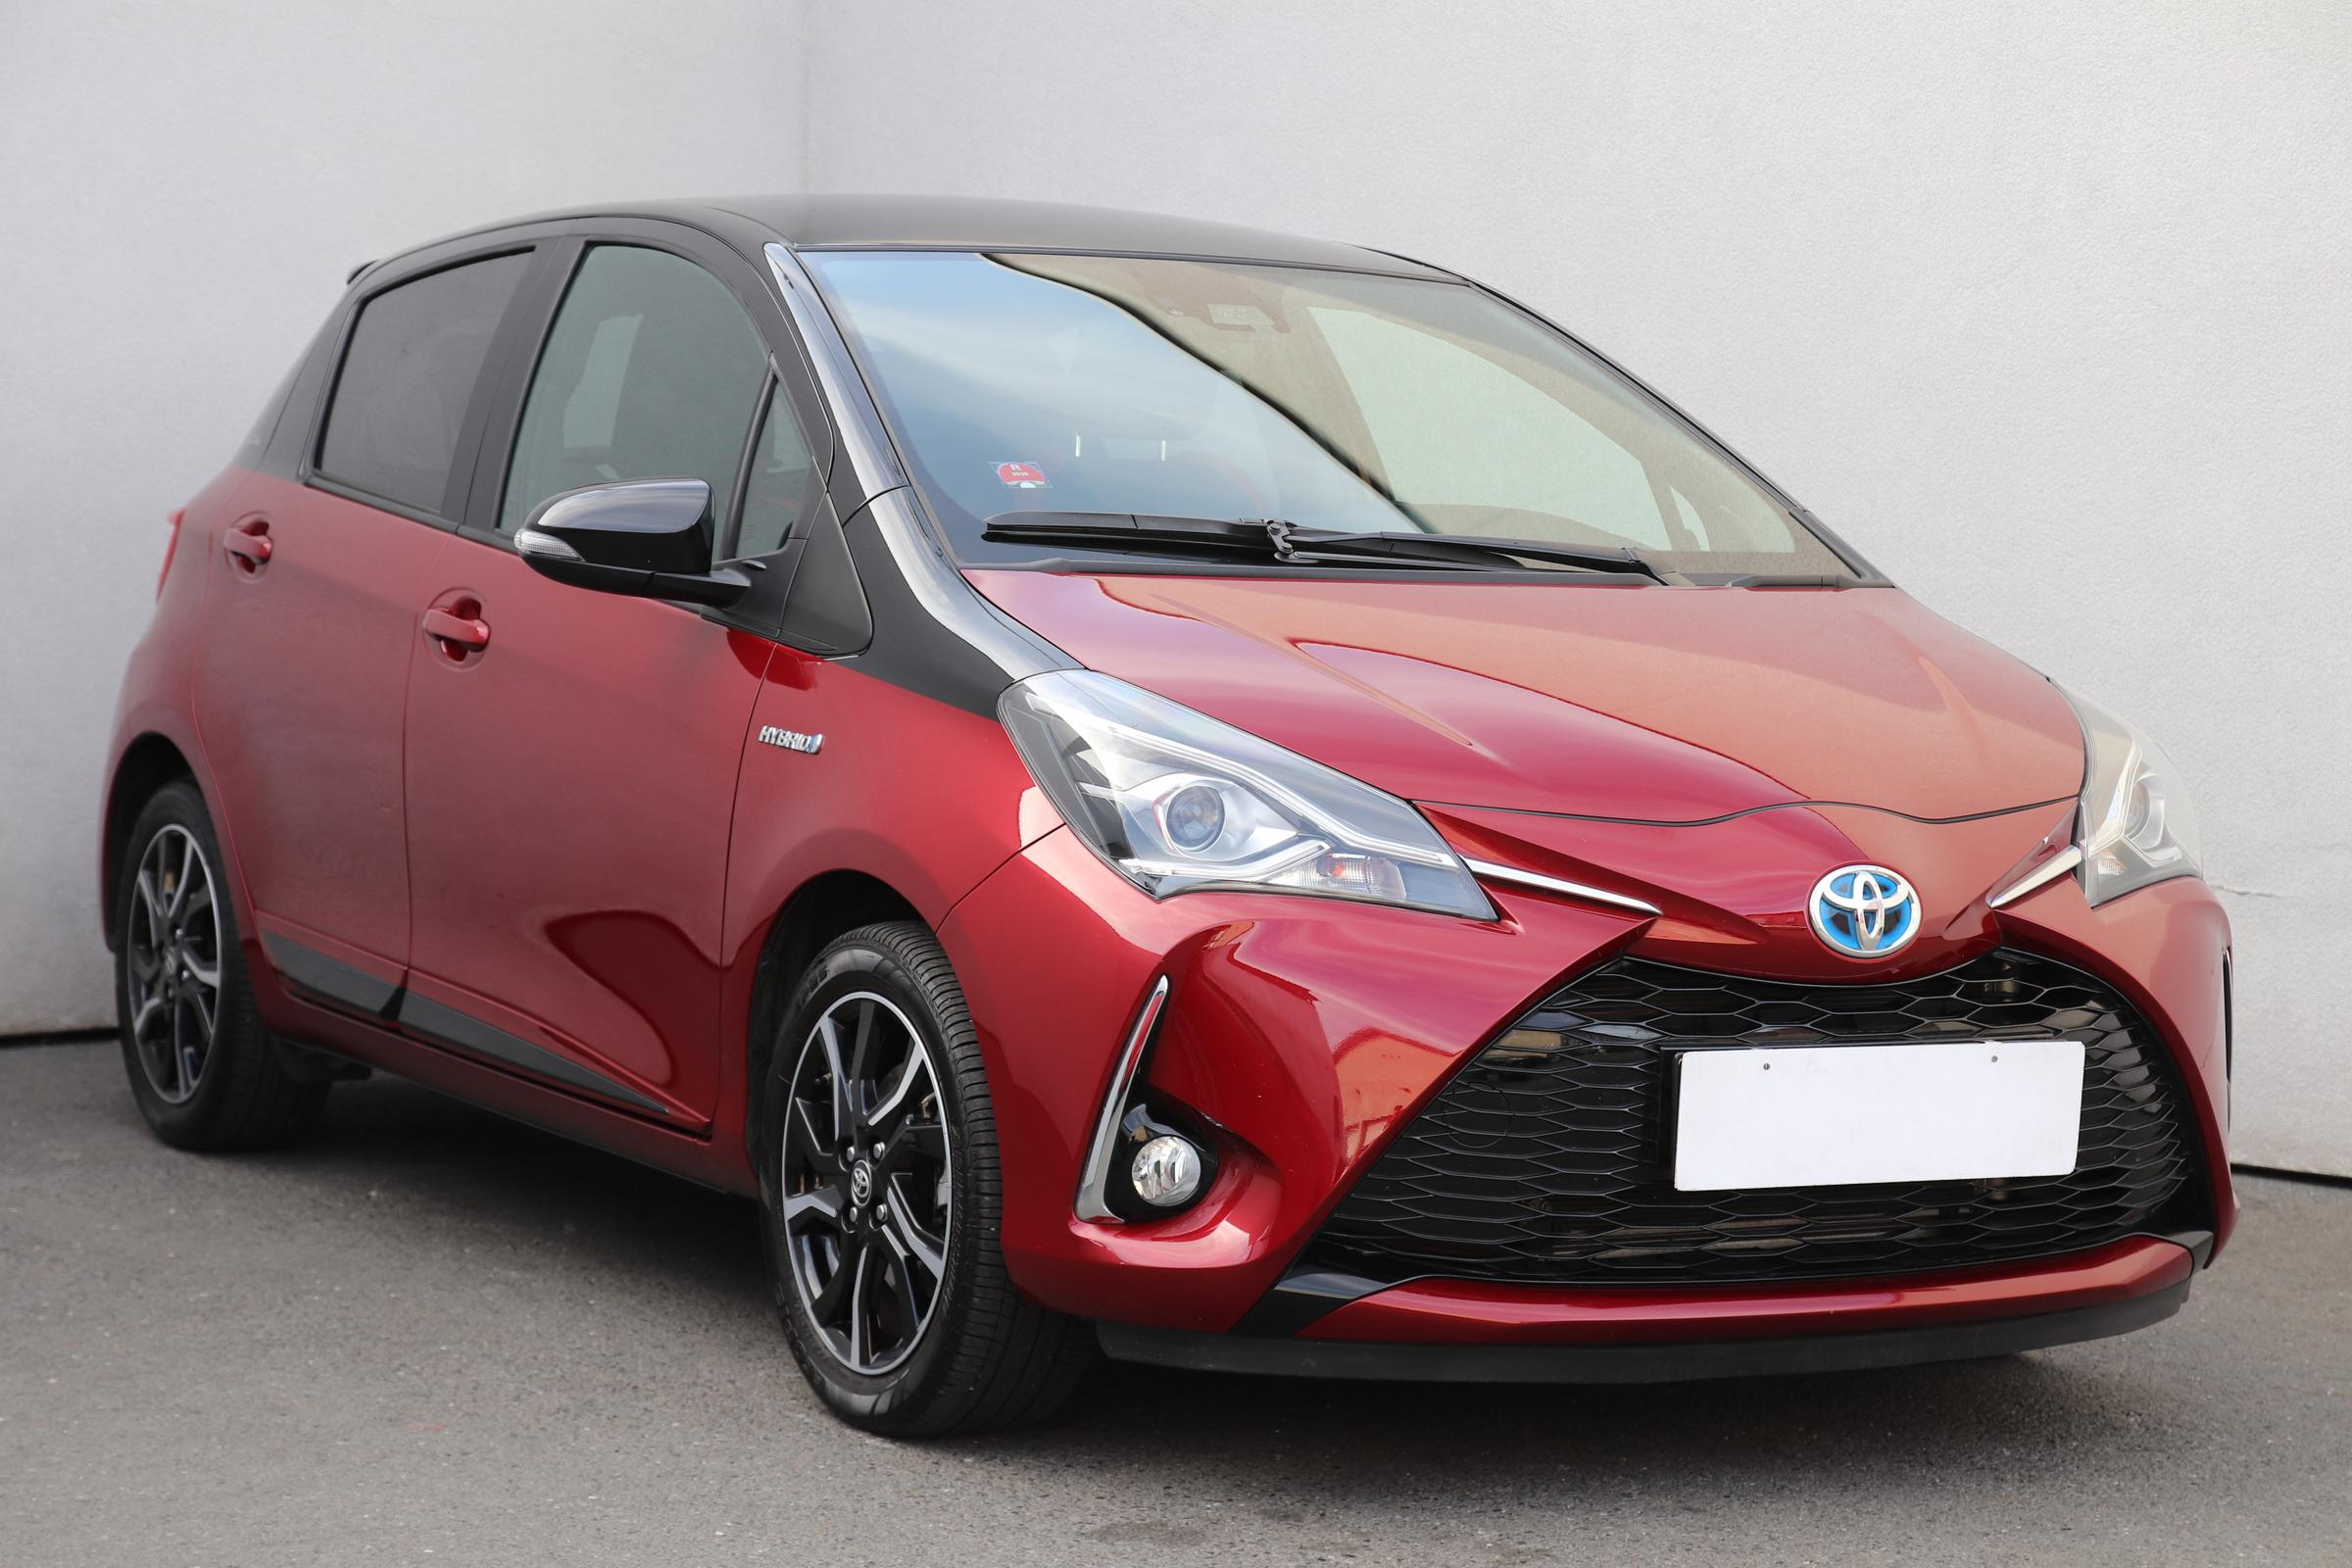 Toyota Yaris 1.5HSD